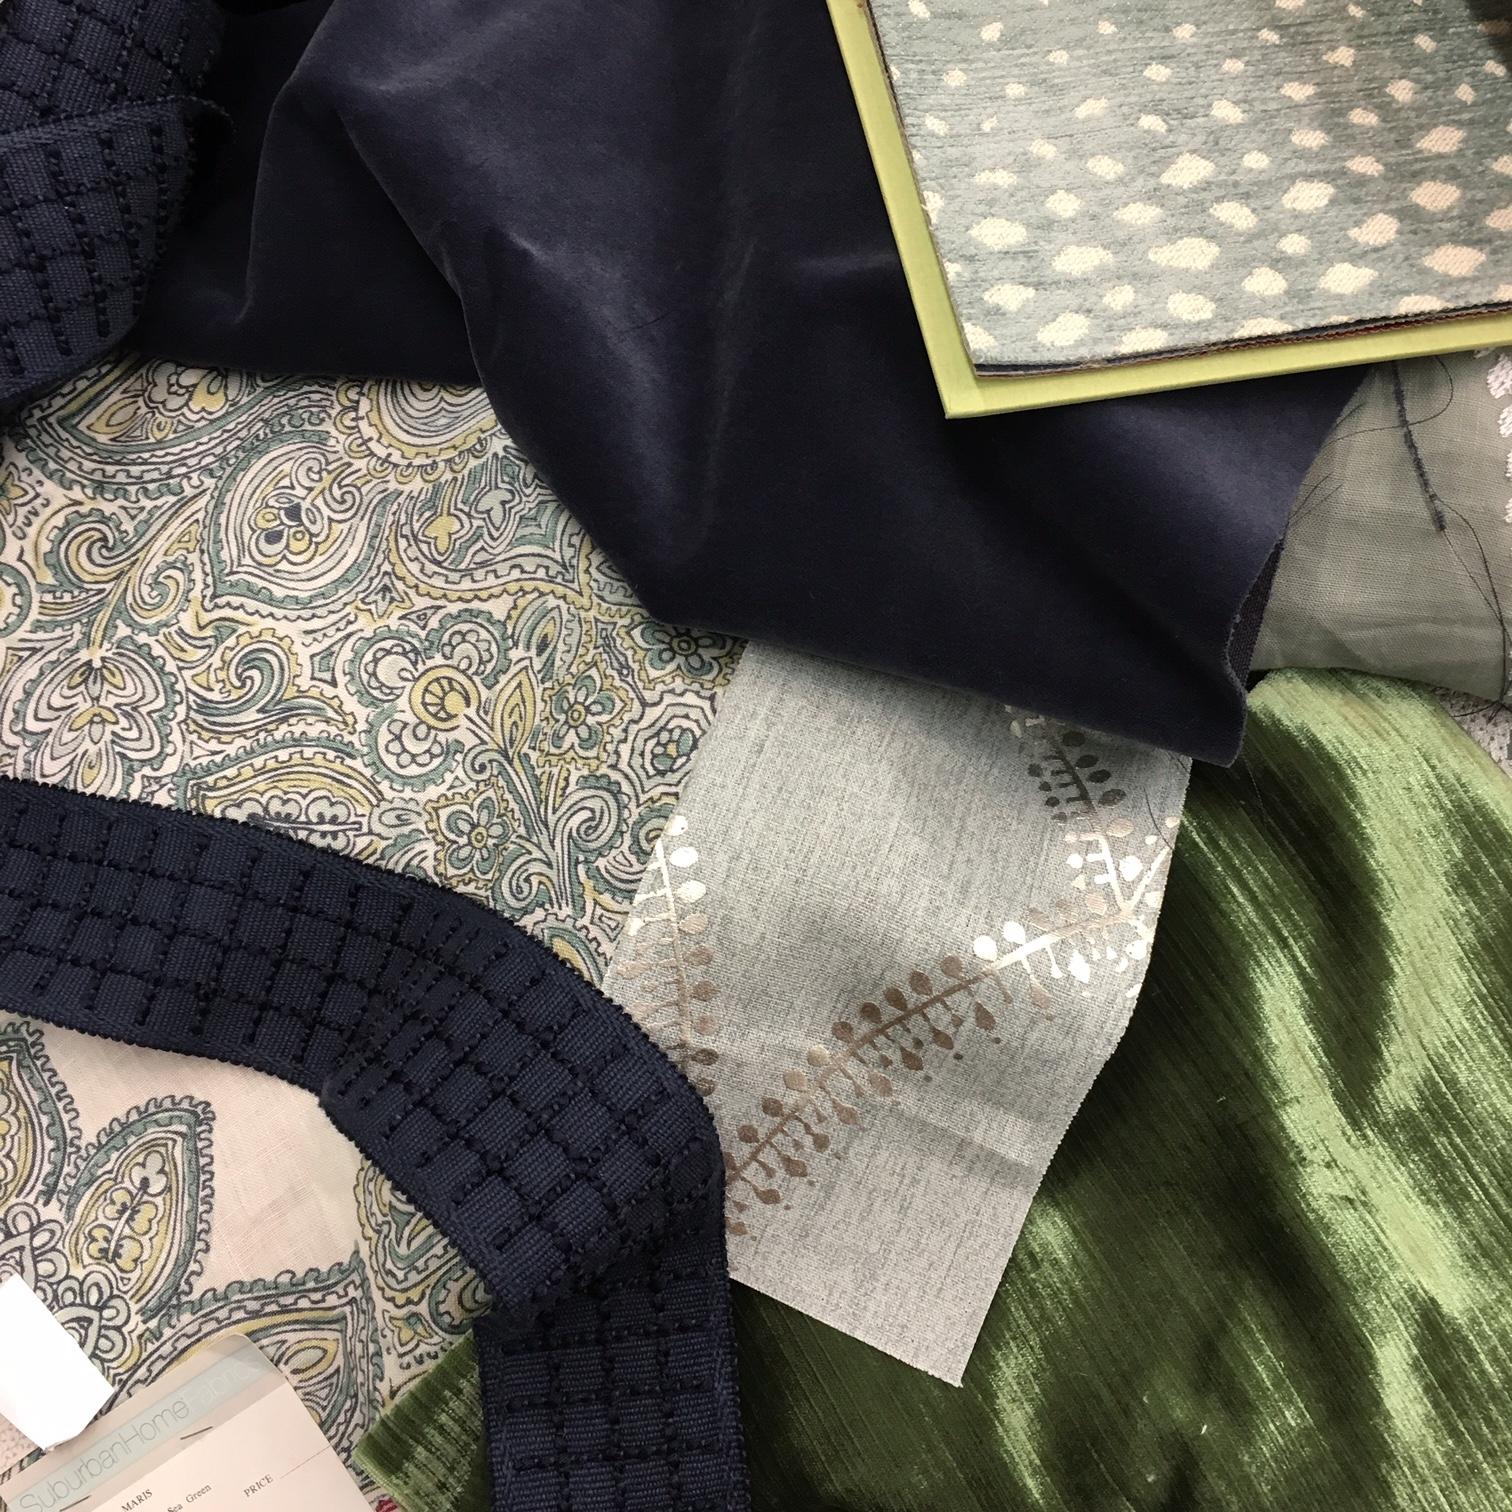 front door fabrics and interiors  u2013 from the designer u2019s desk  aqua  navy  and emerald